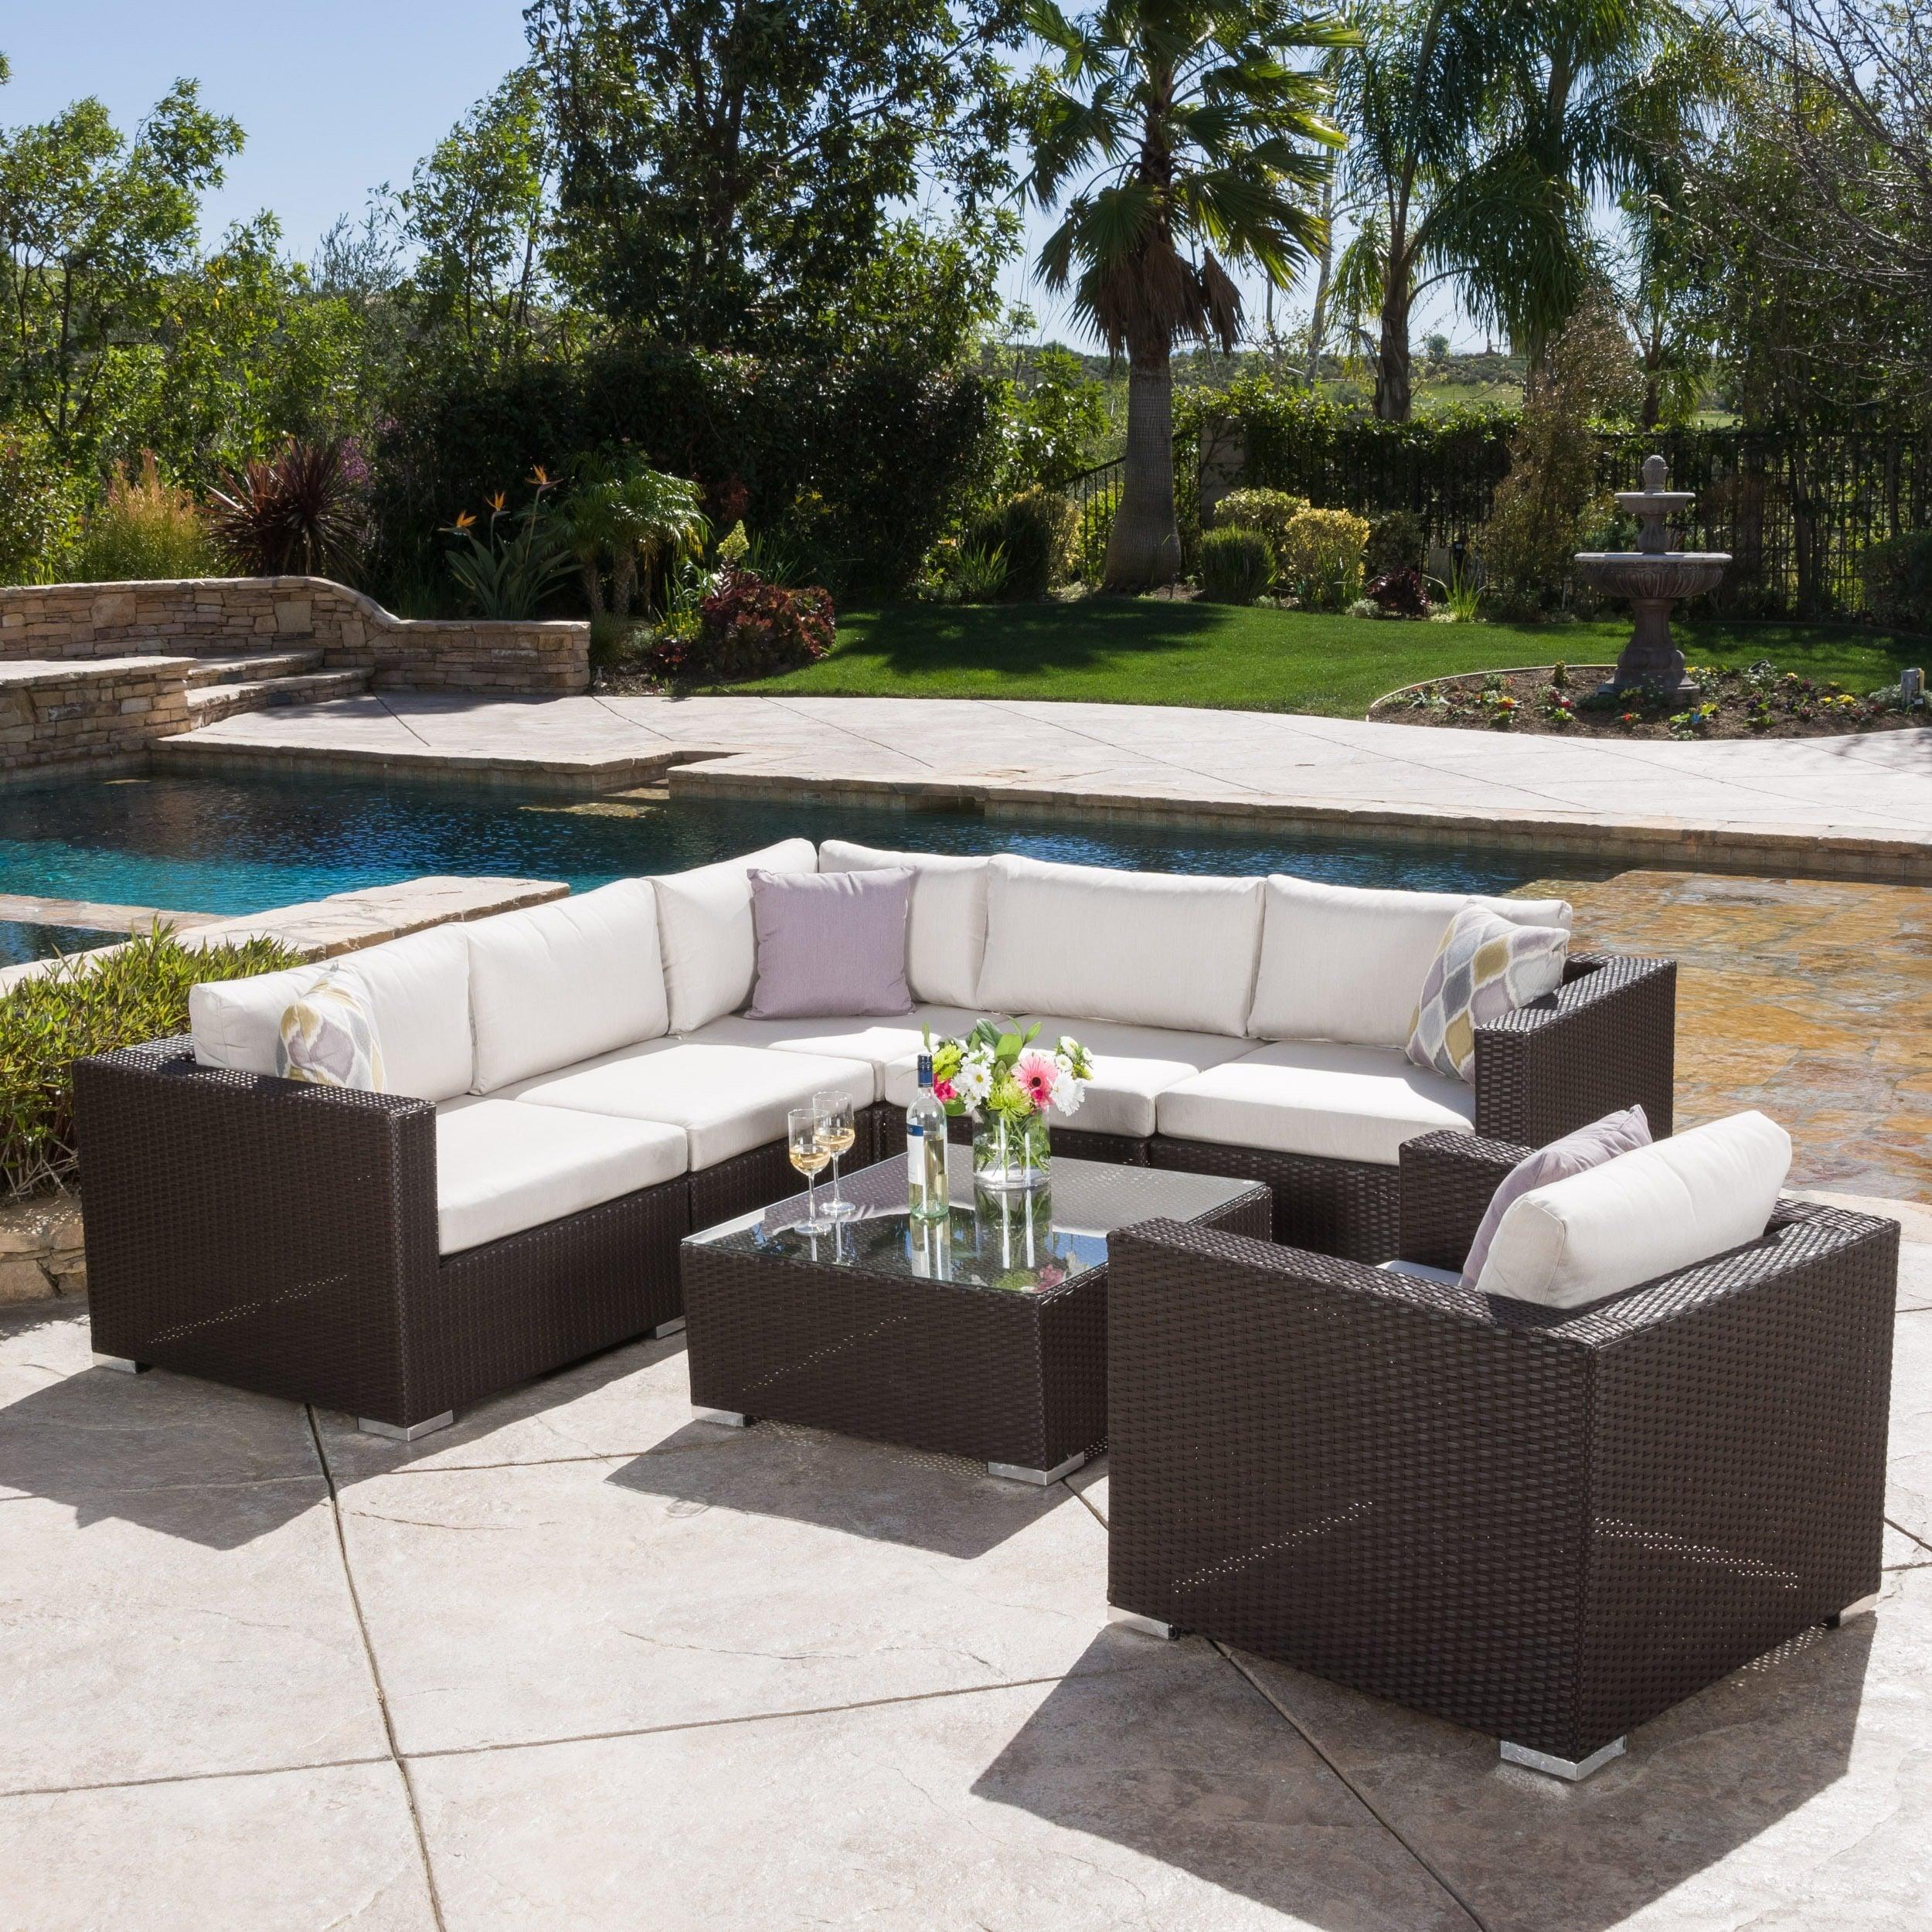 sunbrella patio furniture find great outdoor seating dining rh overstock com sunbrella outdoor furniture sets sunbrella outdoor furniture canada